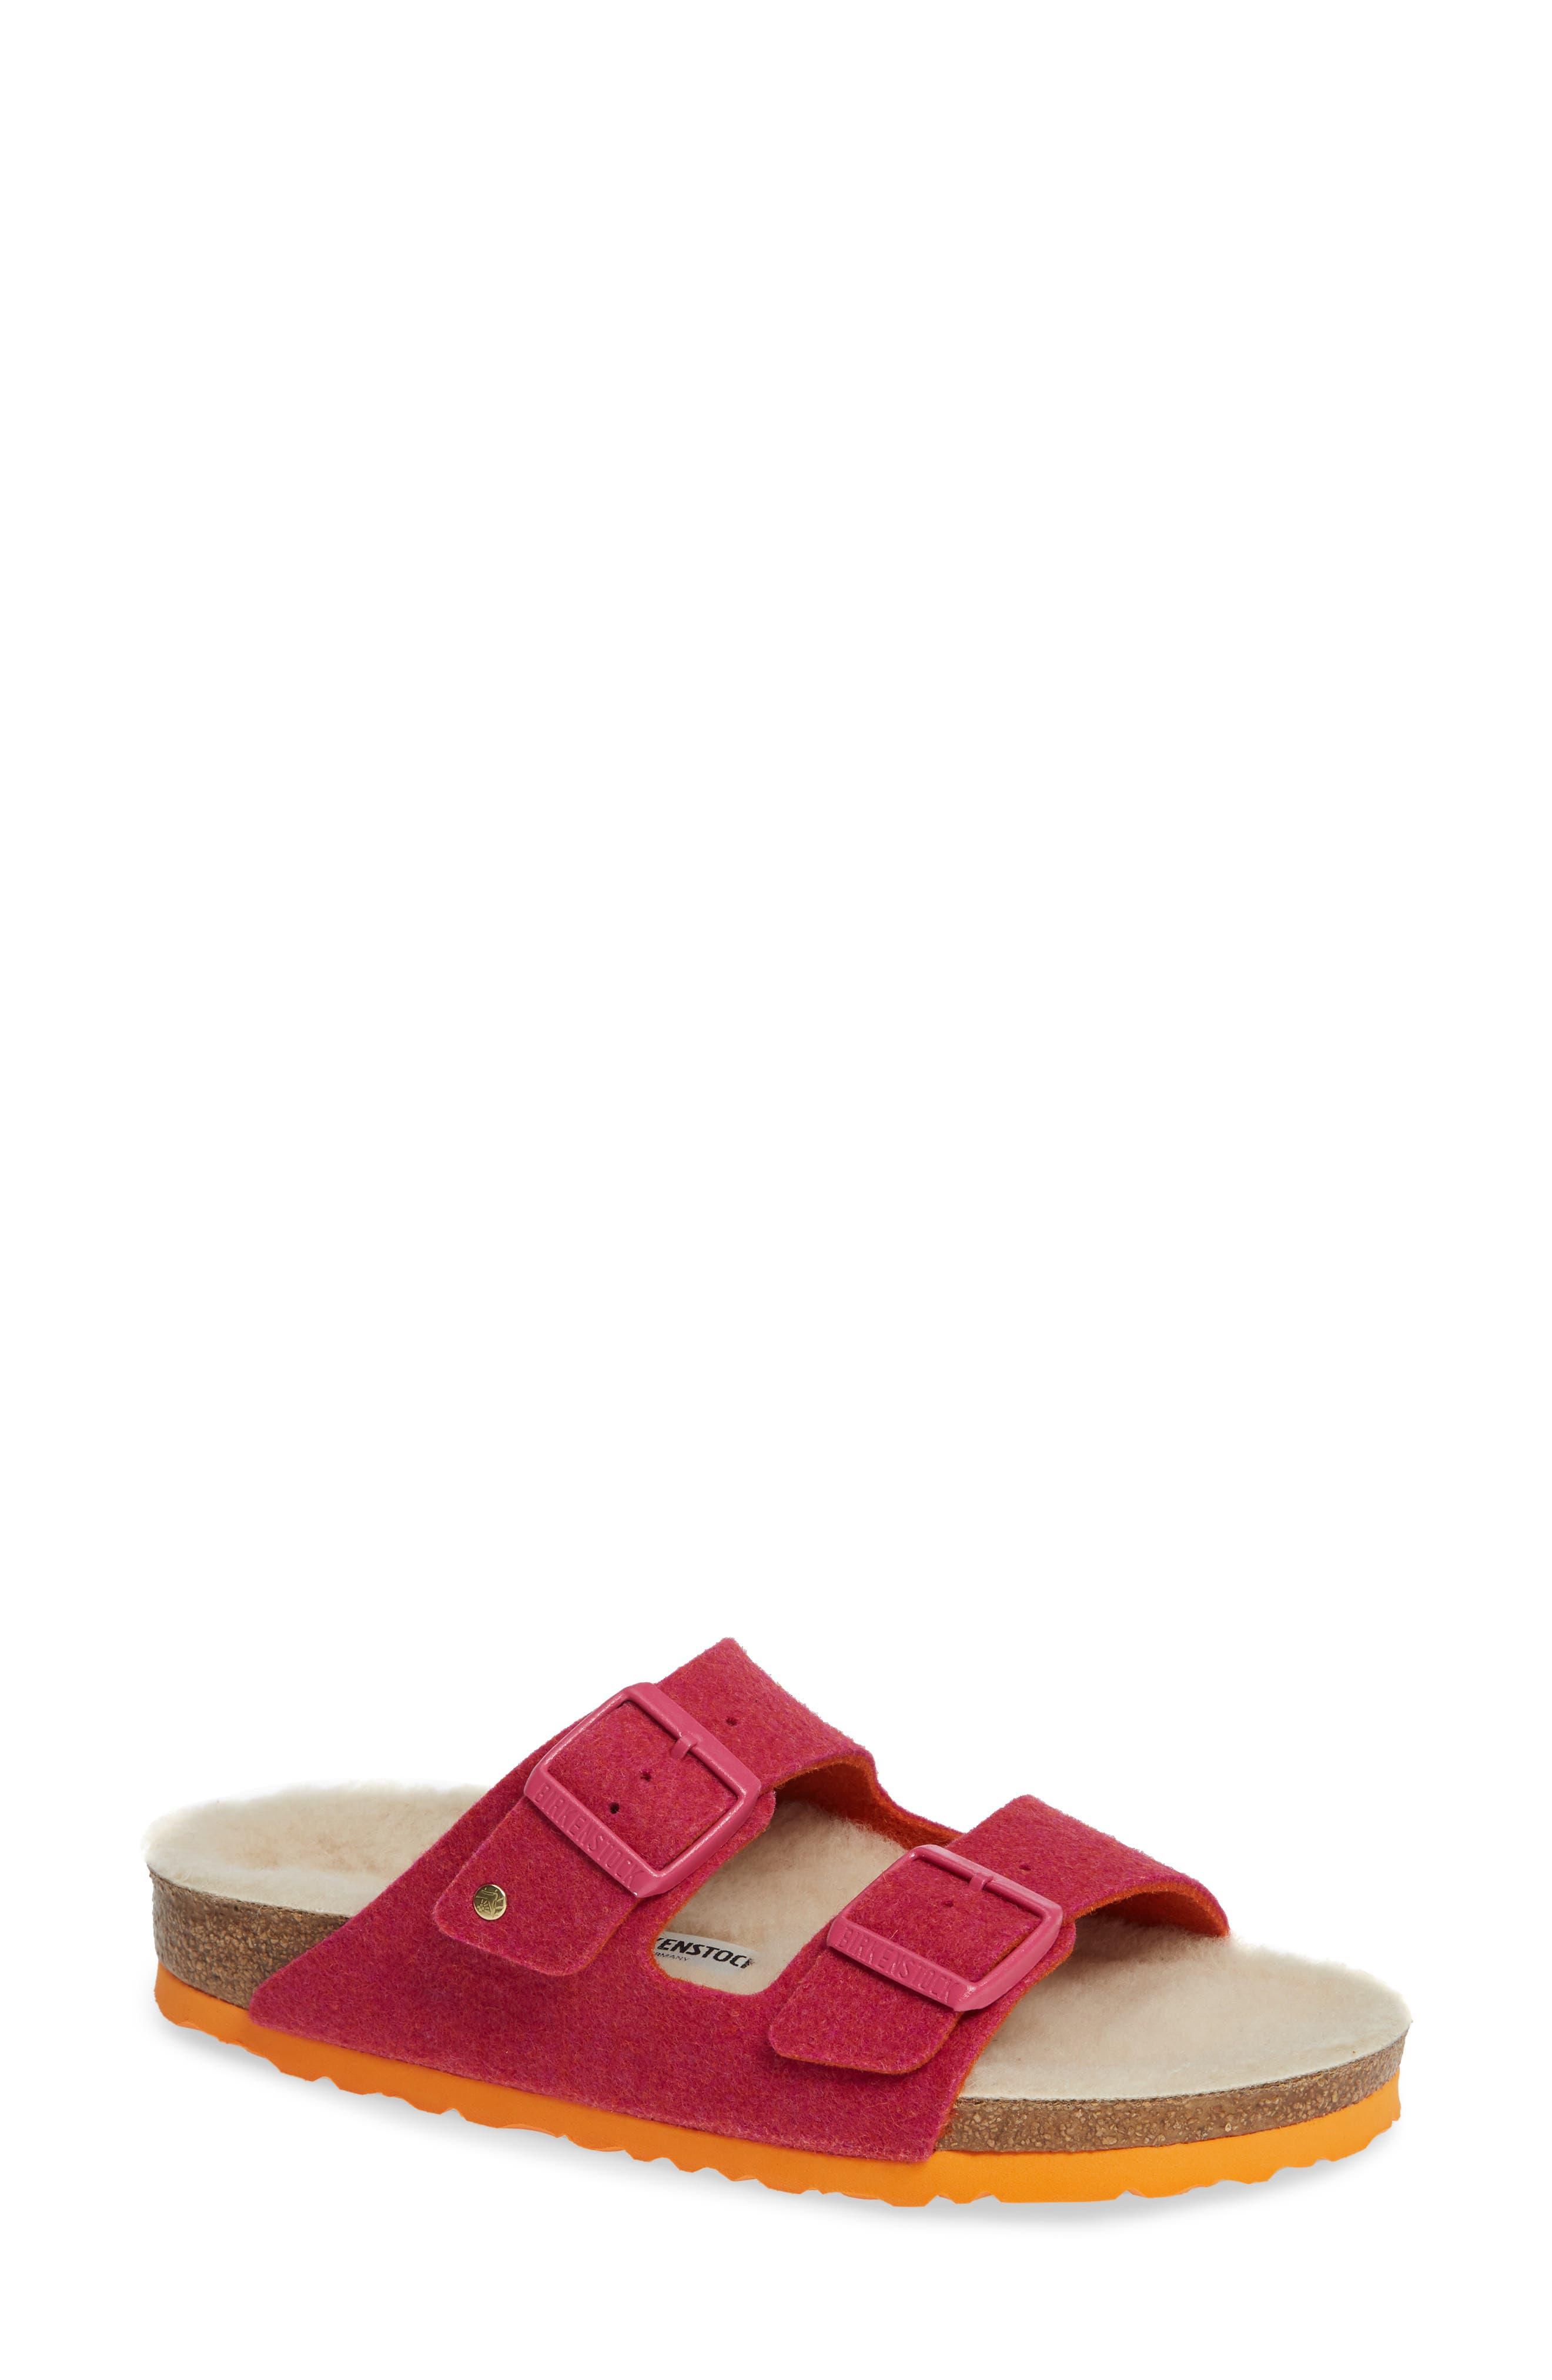 Arizona Happy Slide Sandal, Main, color, FUCHSIA WOOL